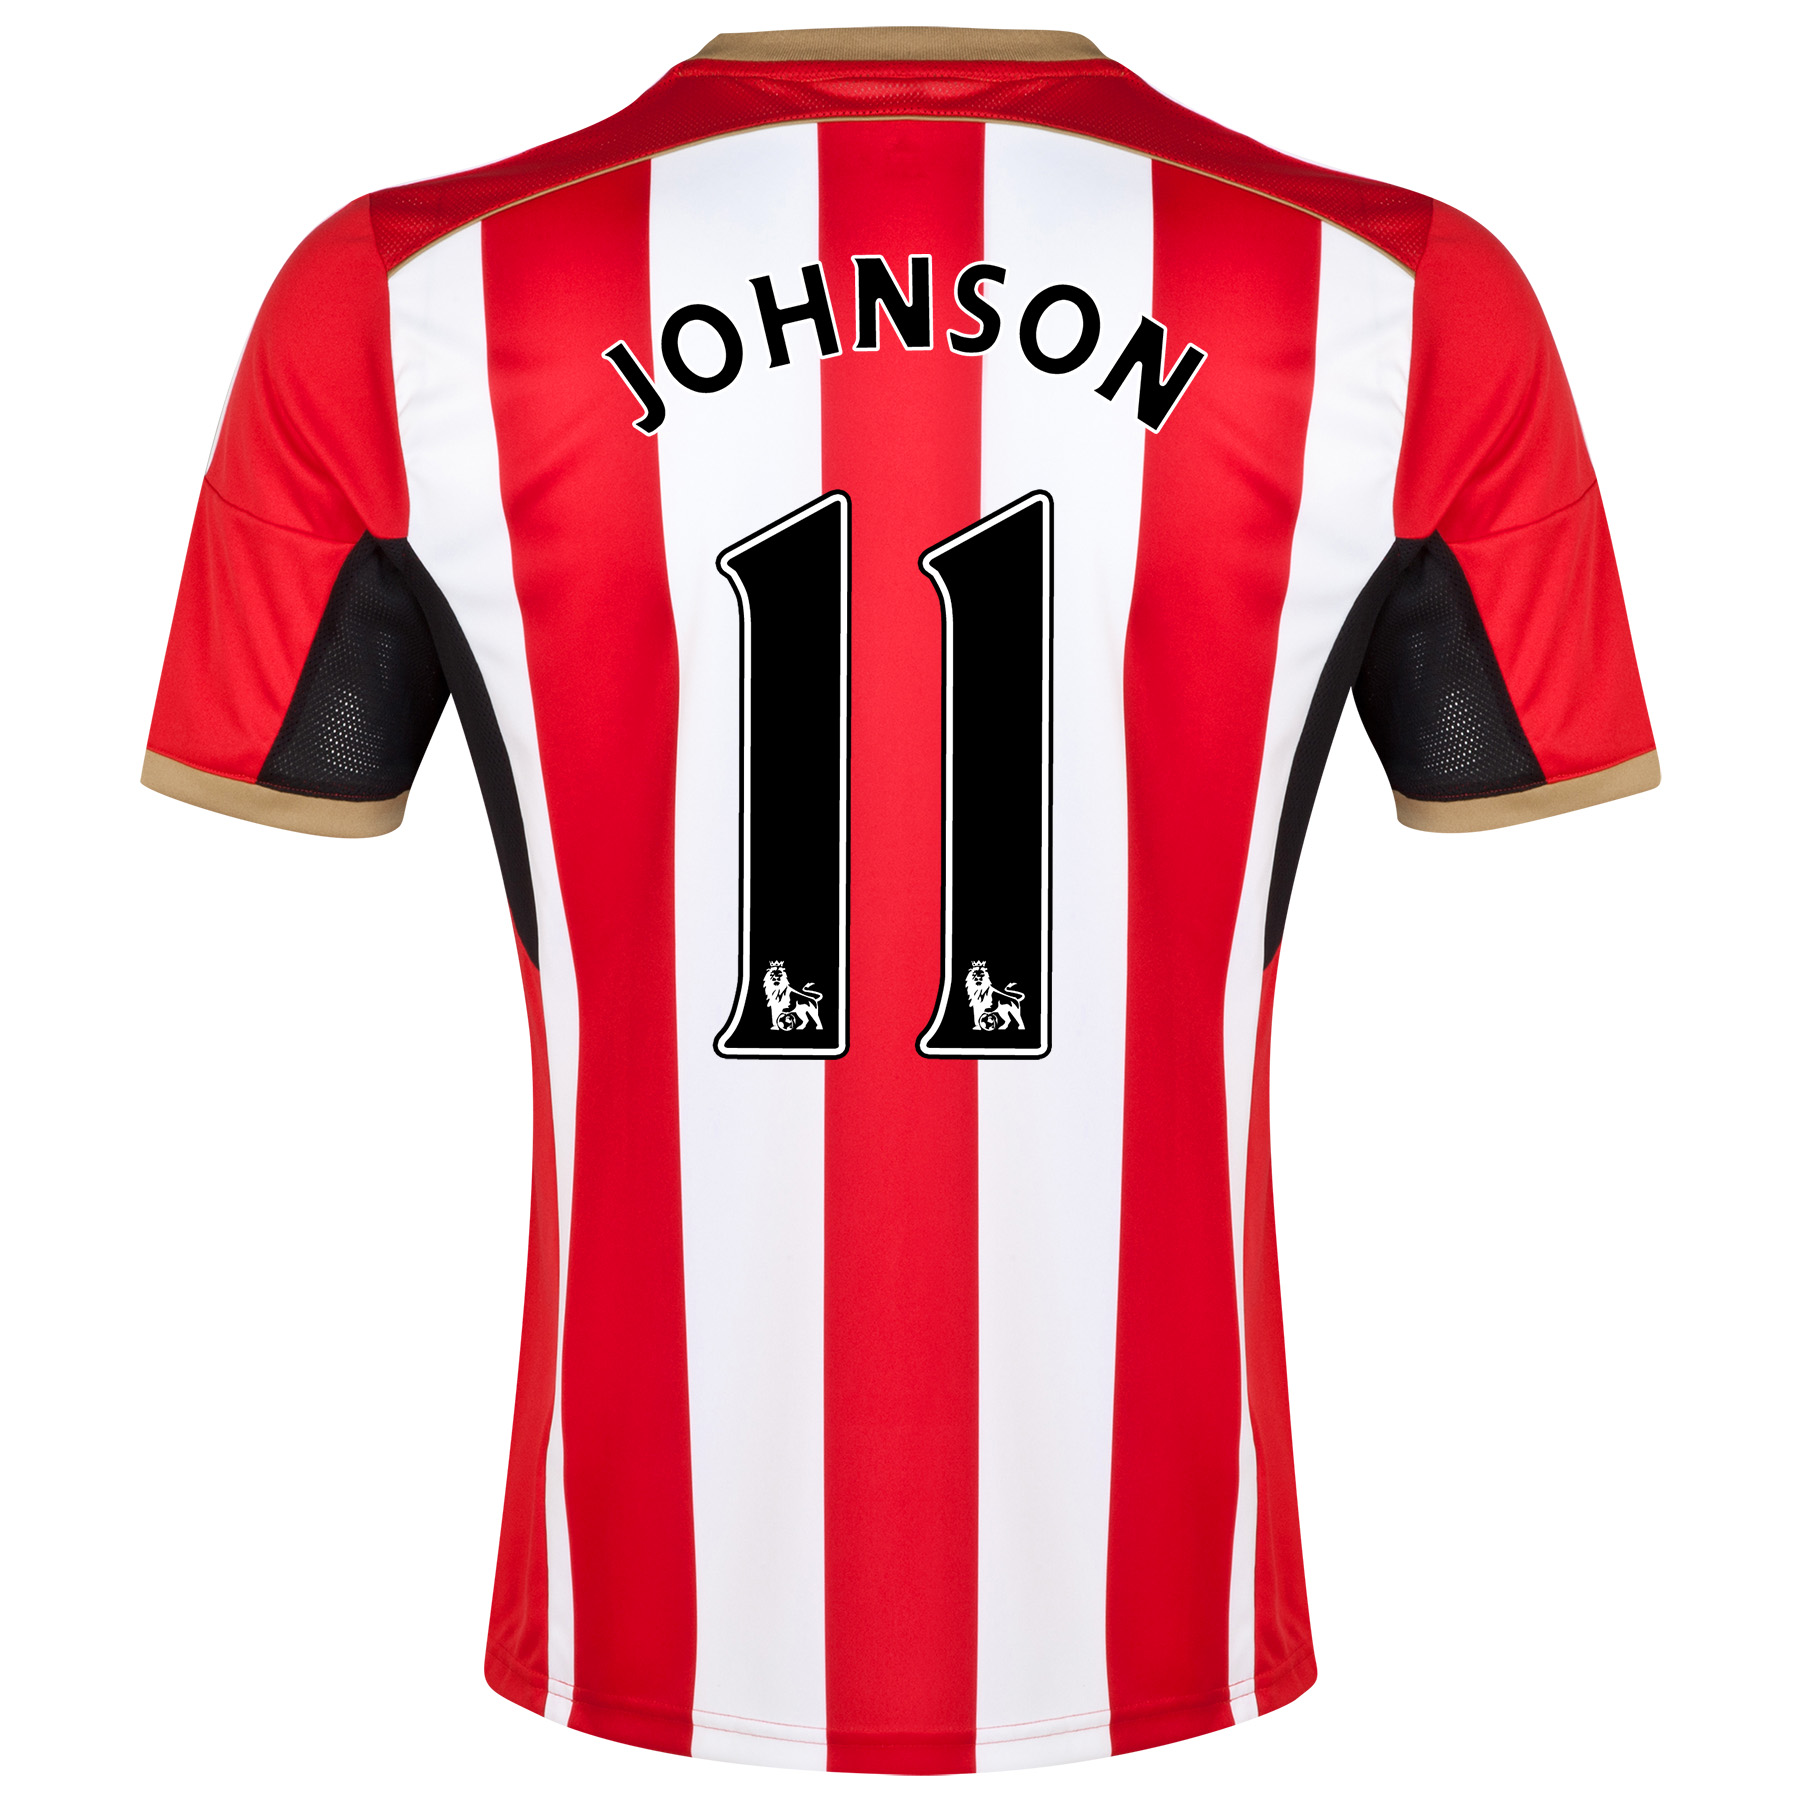 Sunderland Home Shirt 2014/15 Red with Johnson 11 printing